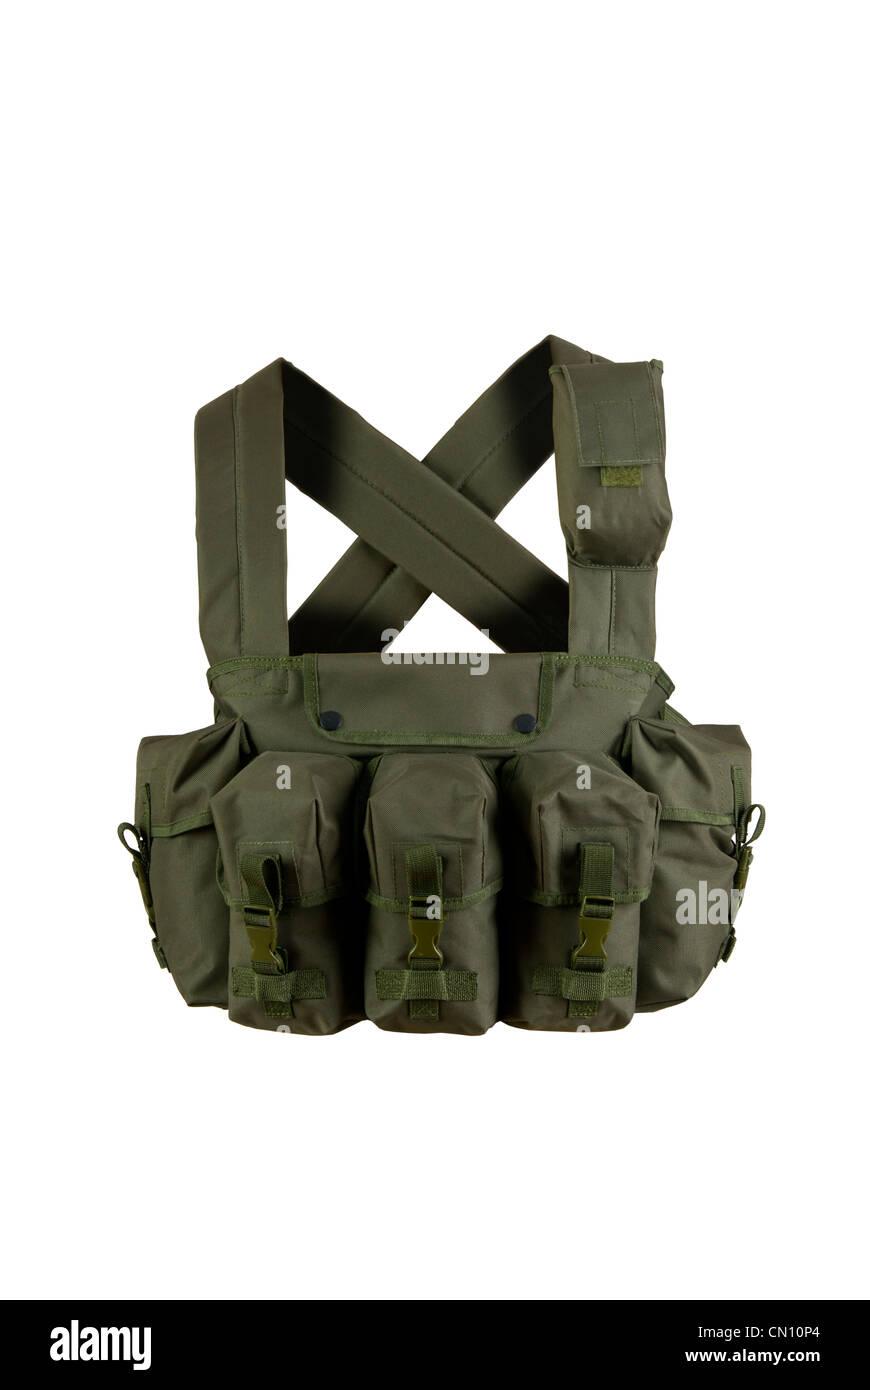 Gilet tactique militaire,,capot,isolé,isolation, Photo Stock